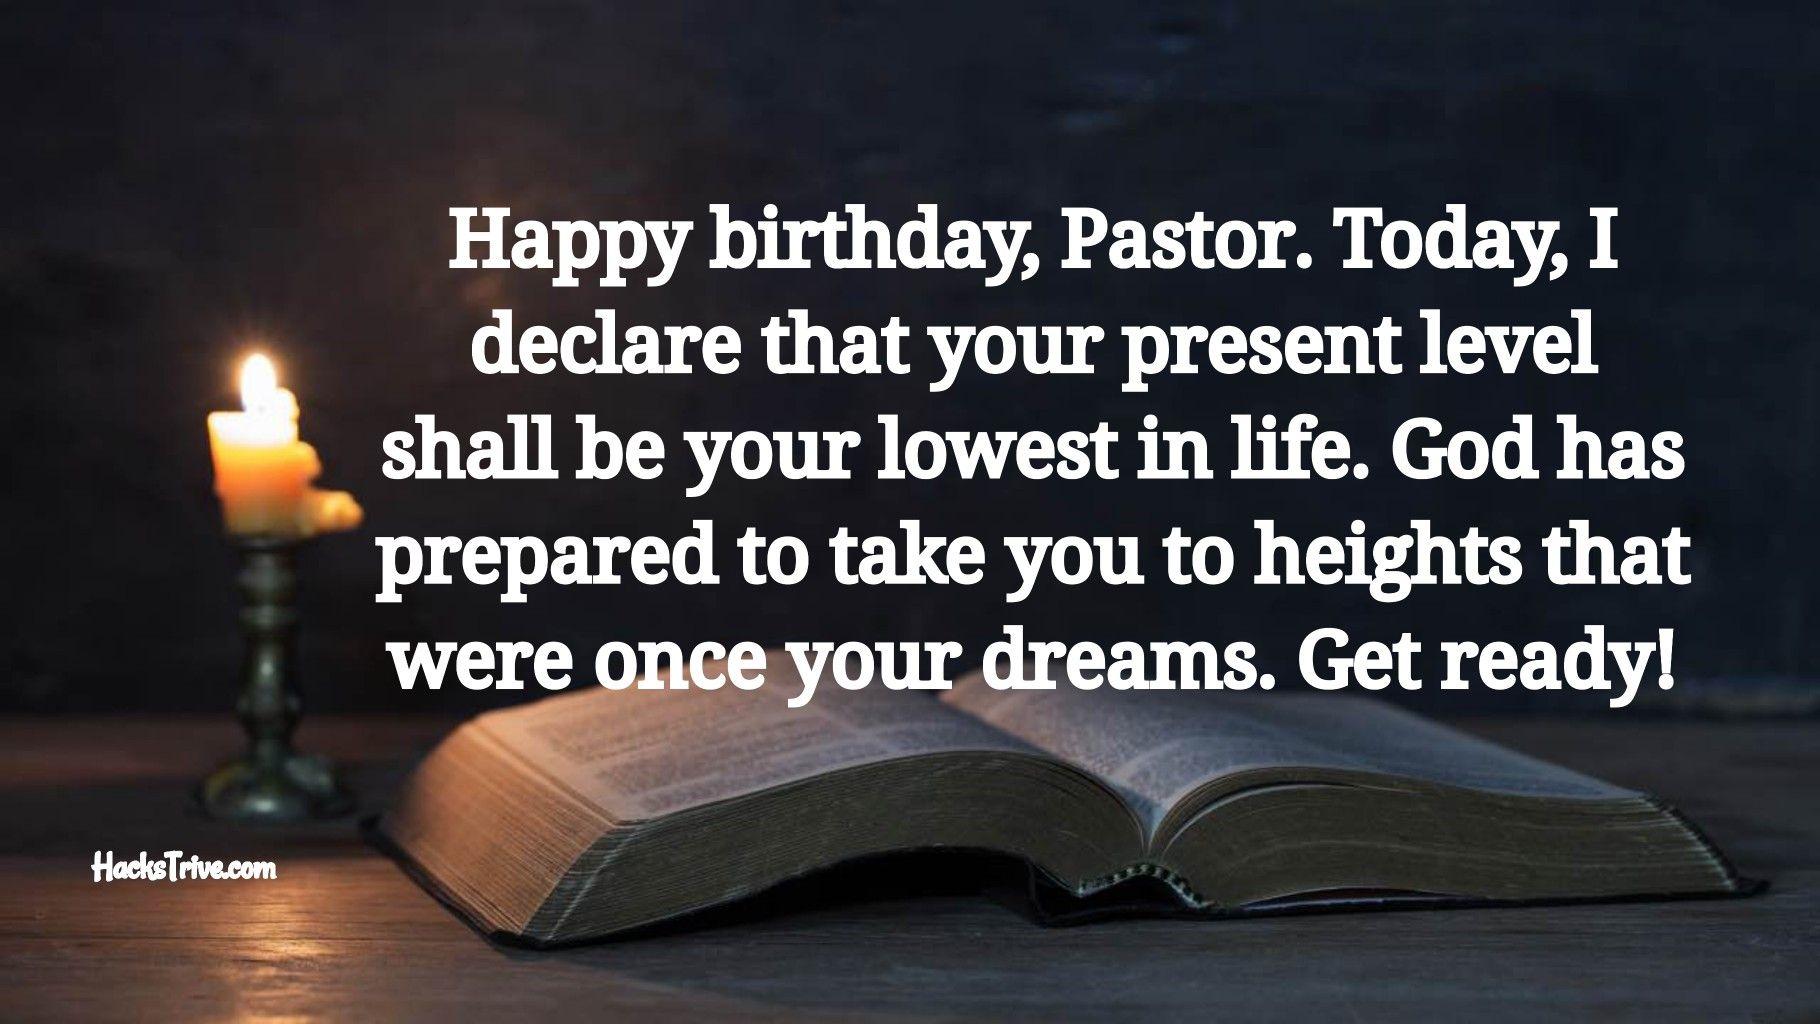 Best Birthday Wishes For Pastor Happy Birthday Pastor Best Birthday Wishes Inspirational Humor